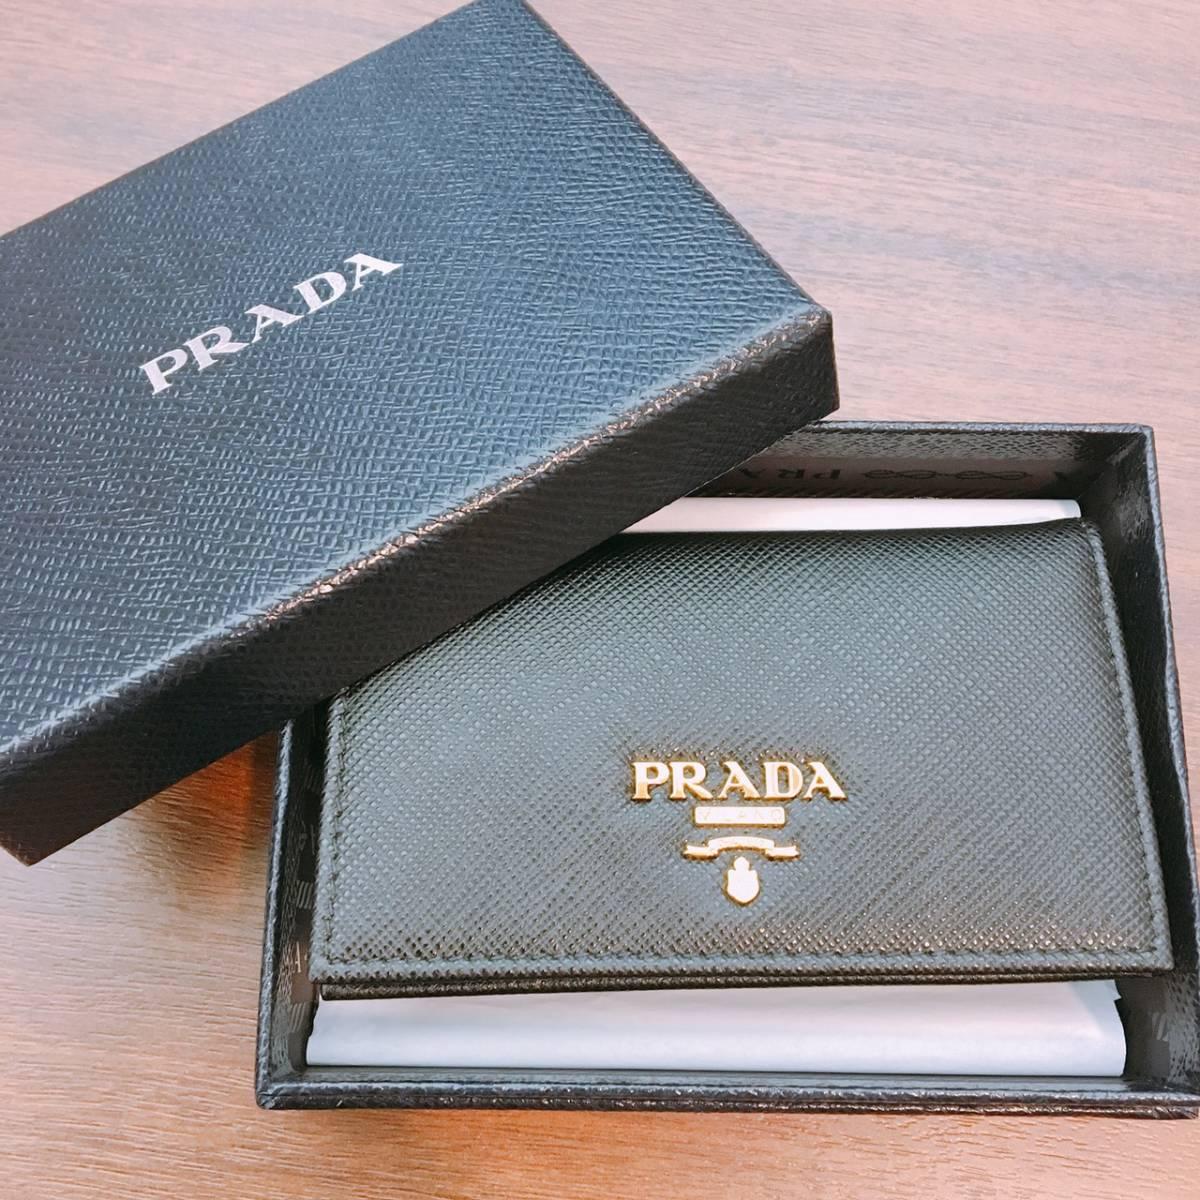 3bb3996716be 【新品・未使用】PRADA プラダ カードケース 名刺入れ 名刺ケース 1MC22 黒